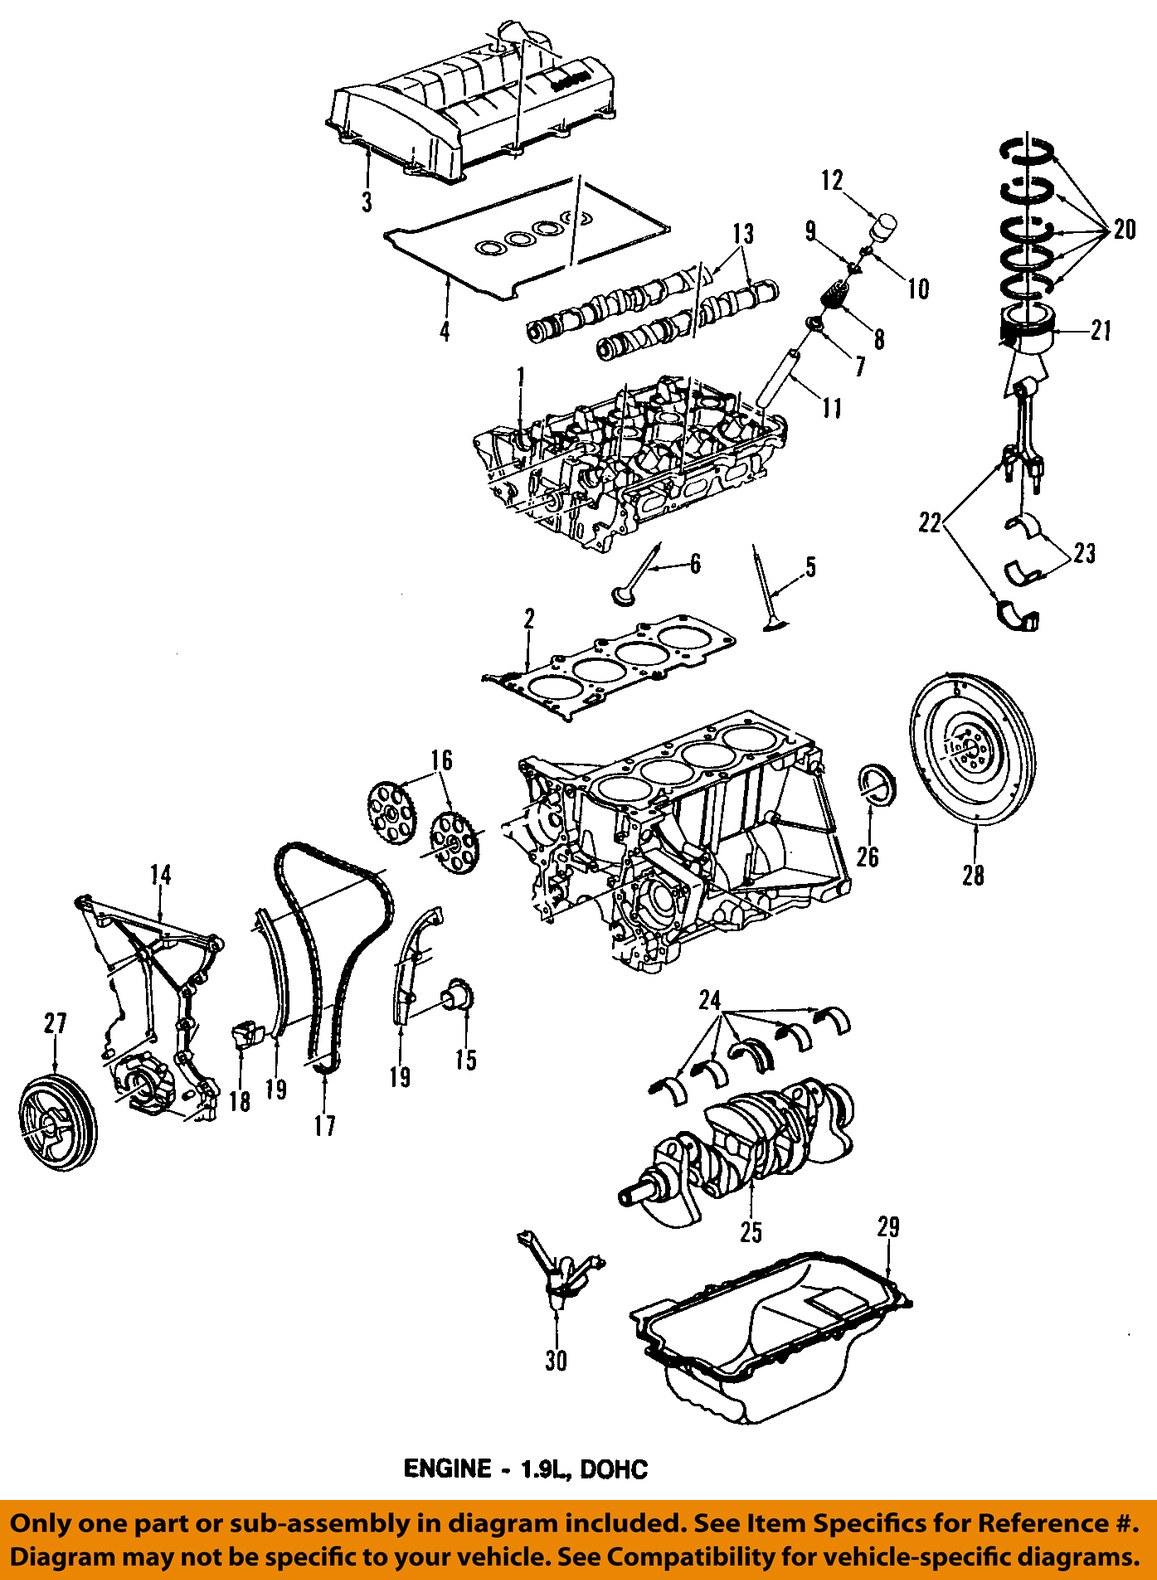 Saturn Sl2 Engine Diagram Valve Cover Wiring Diagrams 2000 Sl Gm Oem 96 98 21007151 Ebay